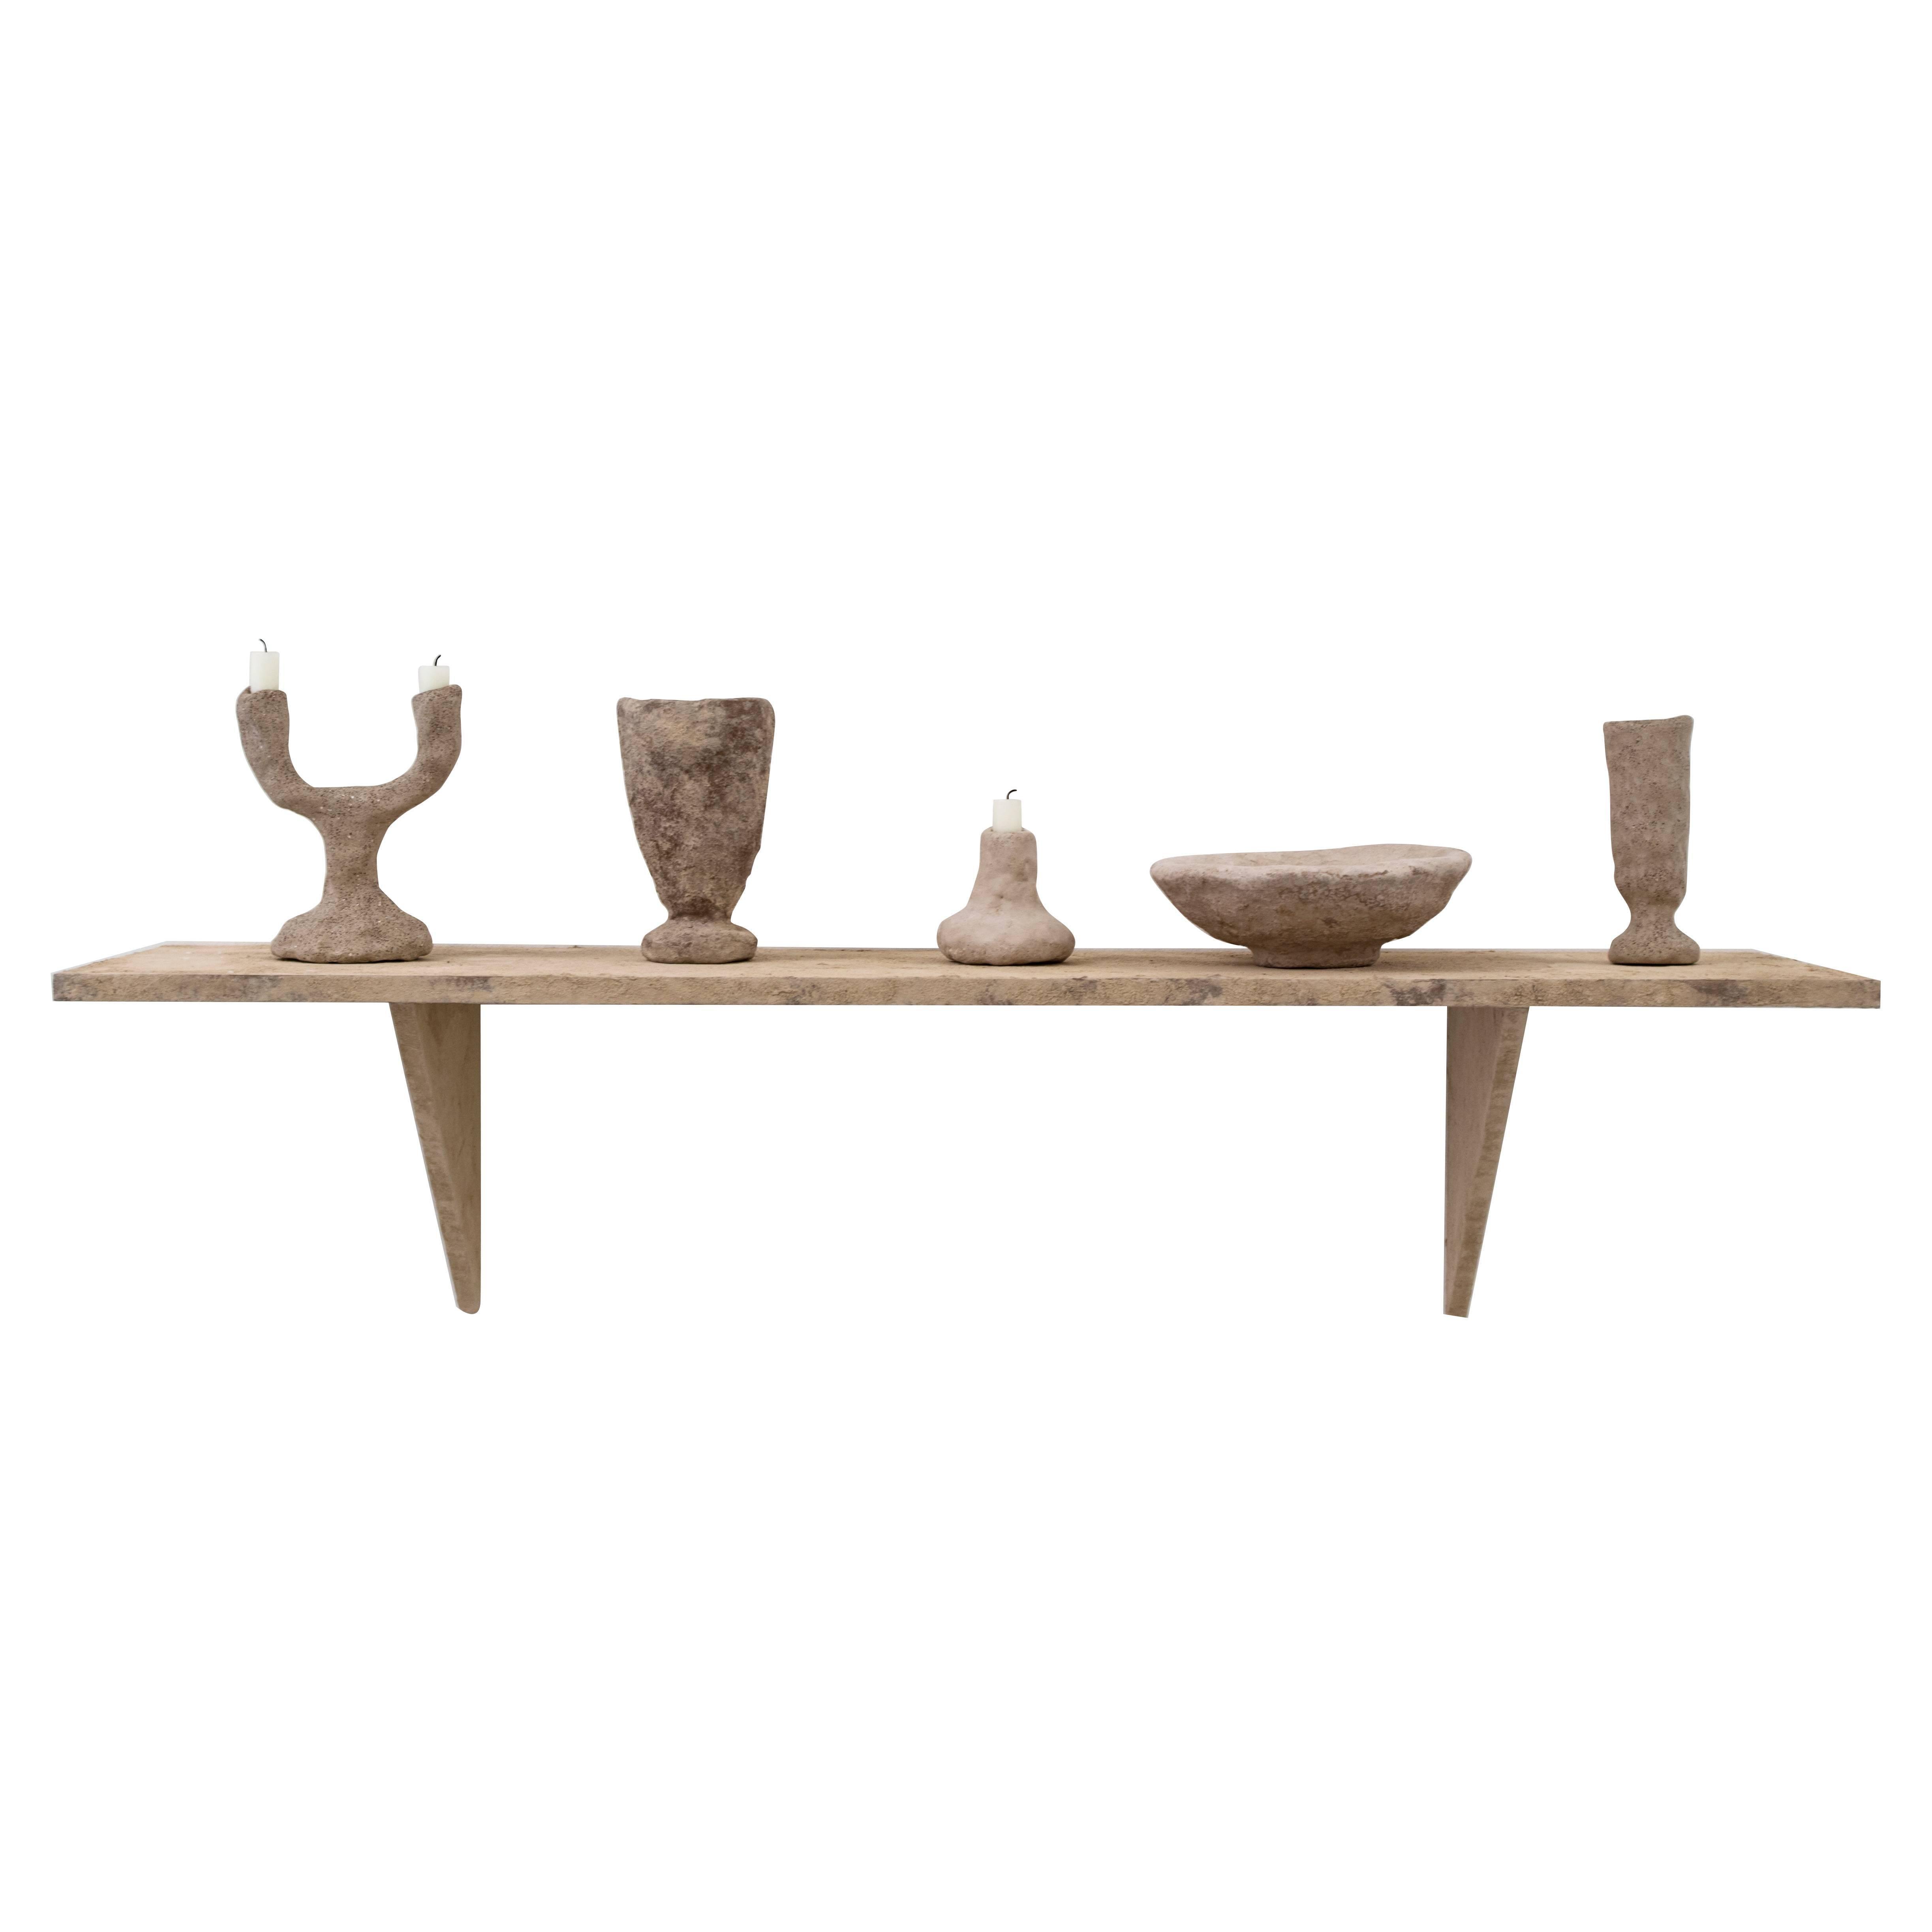 Stoned Shelf with Objects, 'Stoned' Series by Fredrik Paulsen